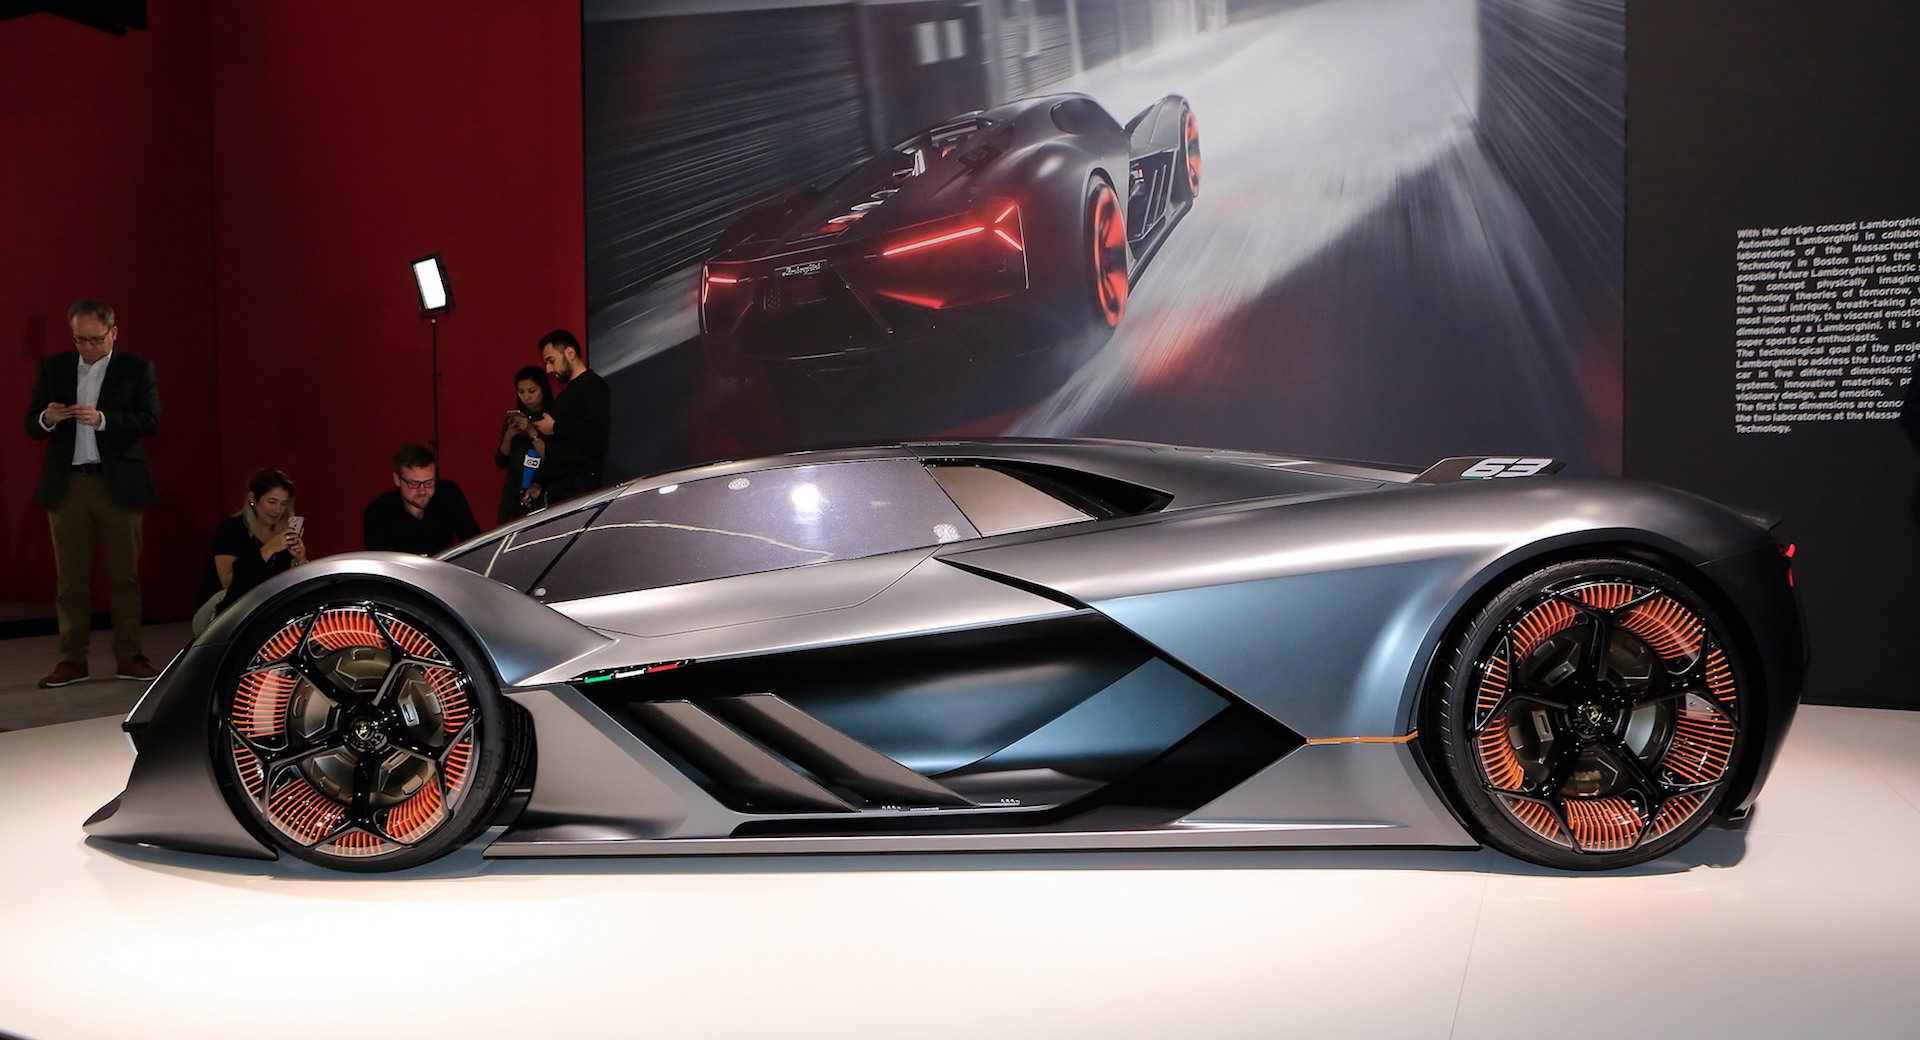 Veneno Hd Wallpaper Lamborghini Terzo Millennio Is A Bat Crazy Concept You